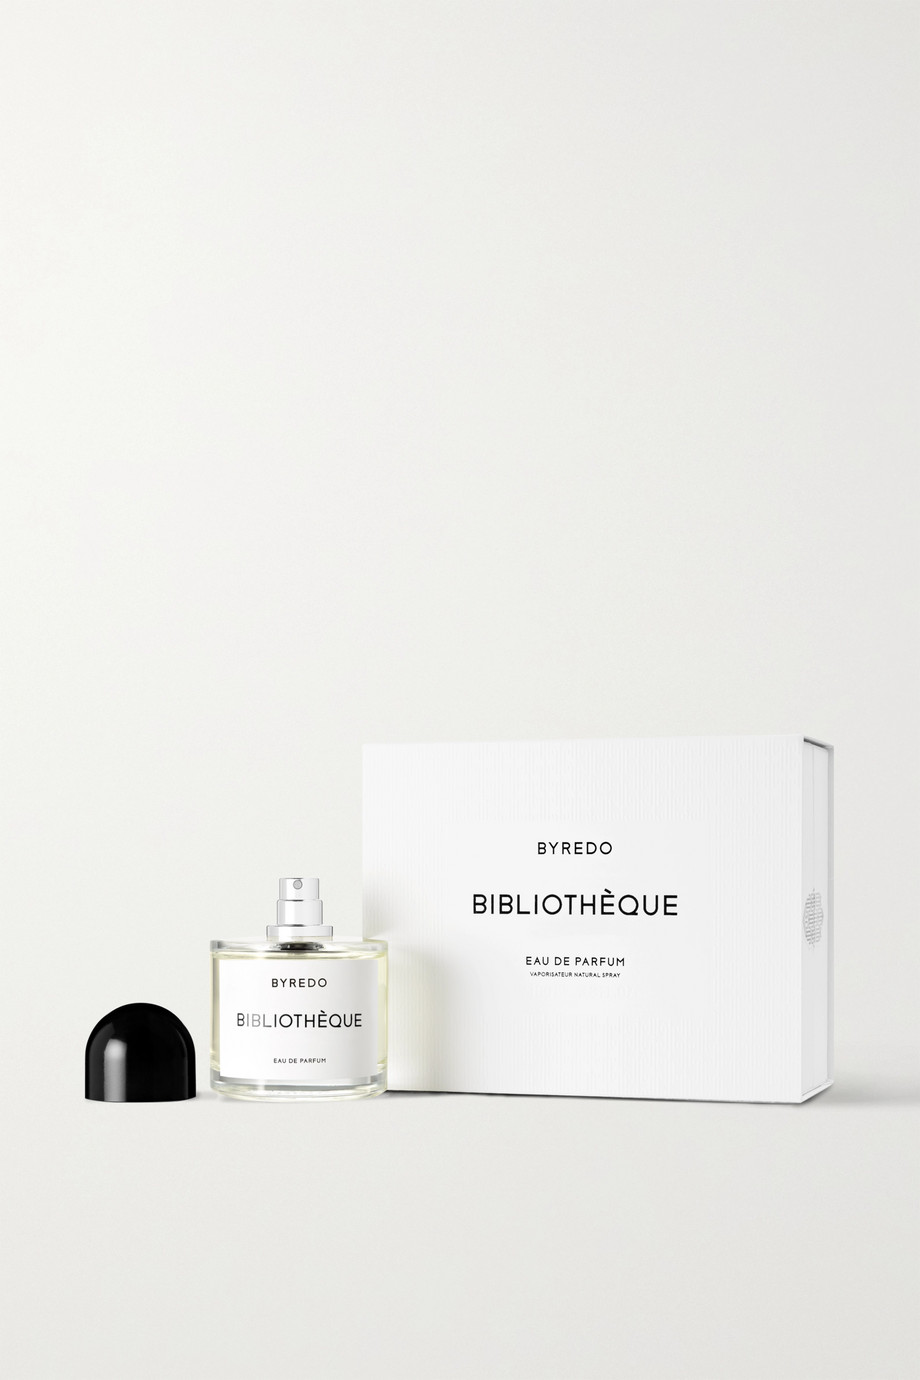 Byredo Eau de Parfum - Bibliothèque, 100ml